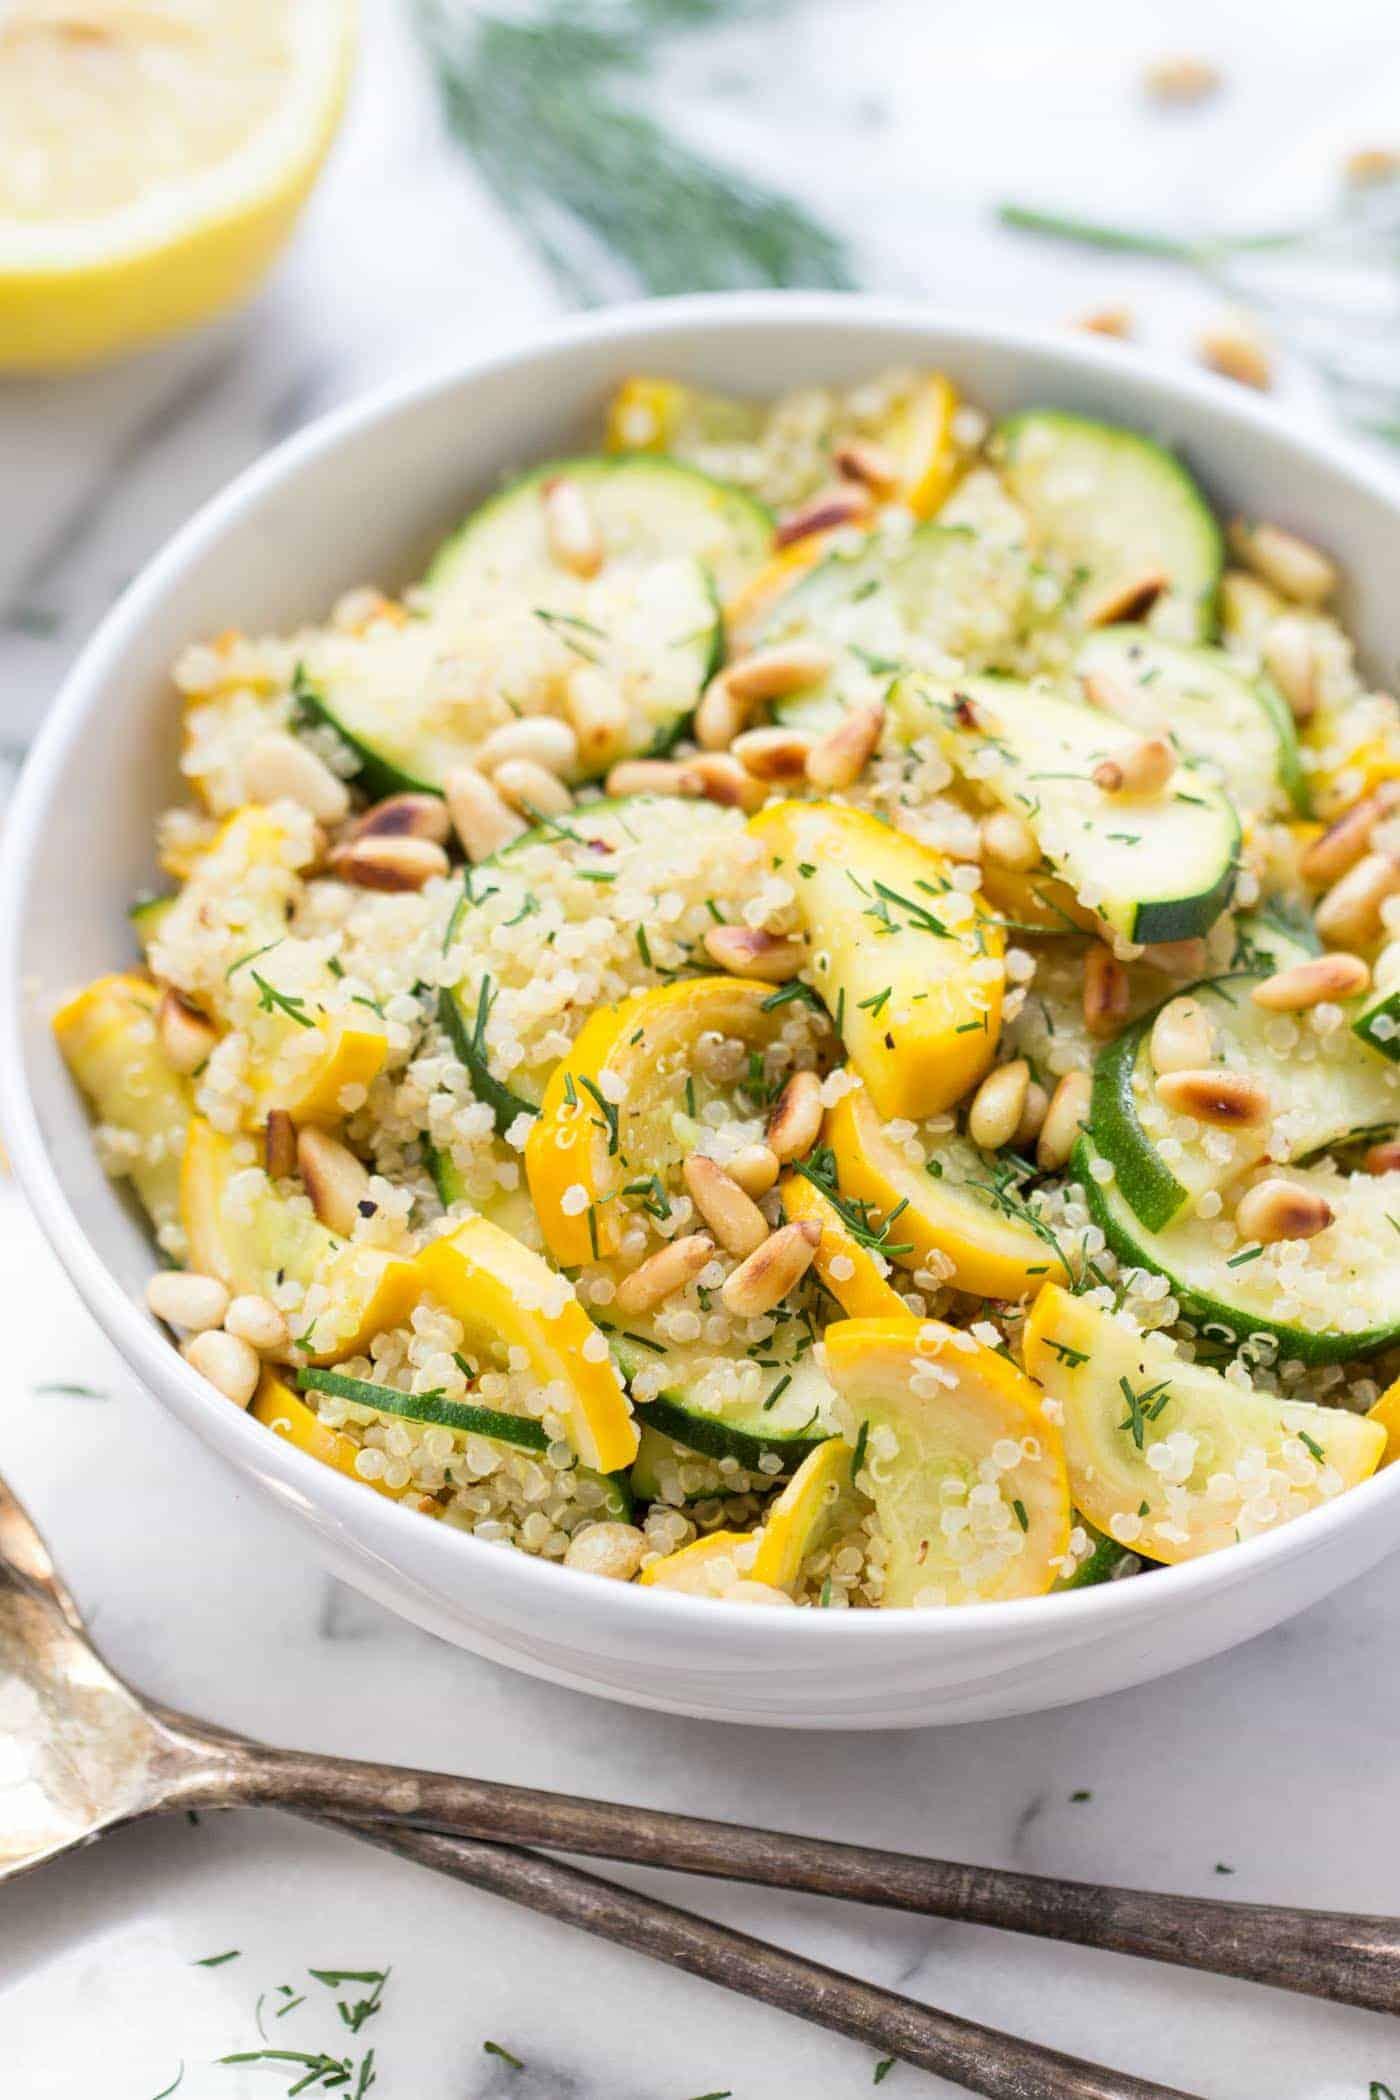 Summer Squash + Zucchini Quinoa Salad - Simply Quinoa